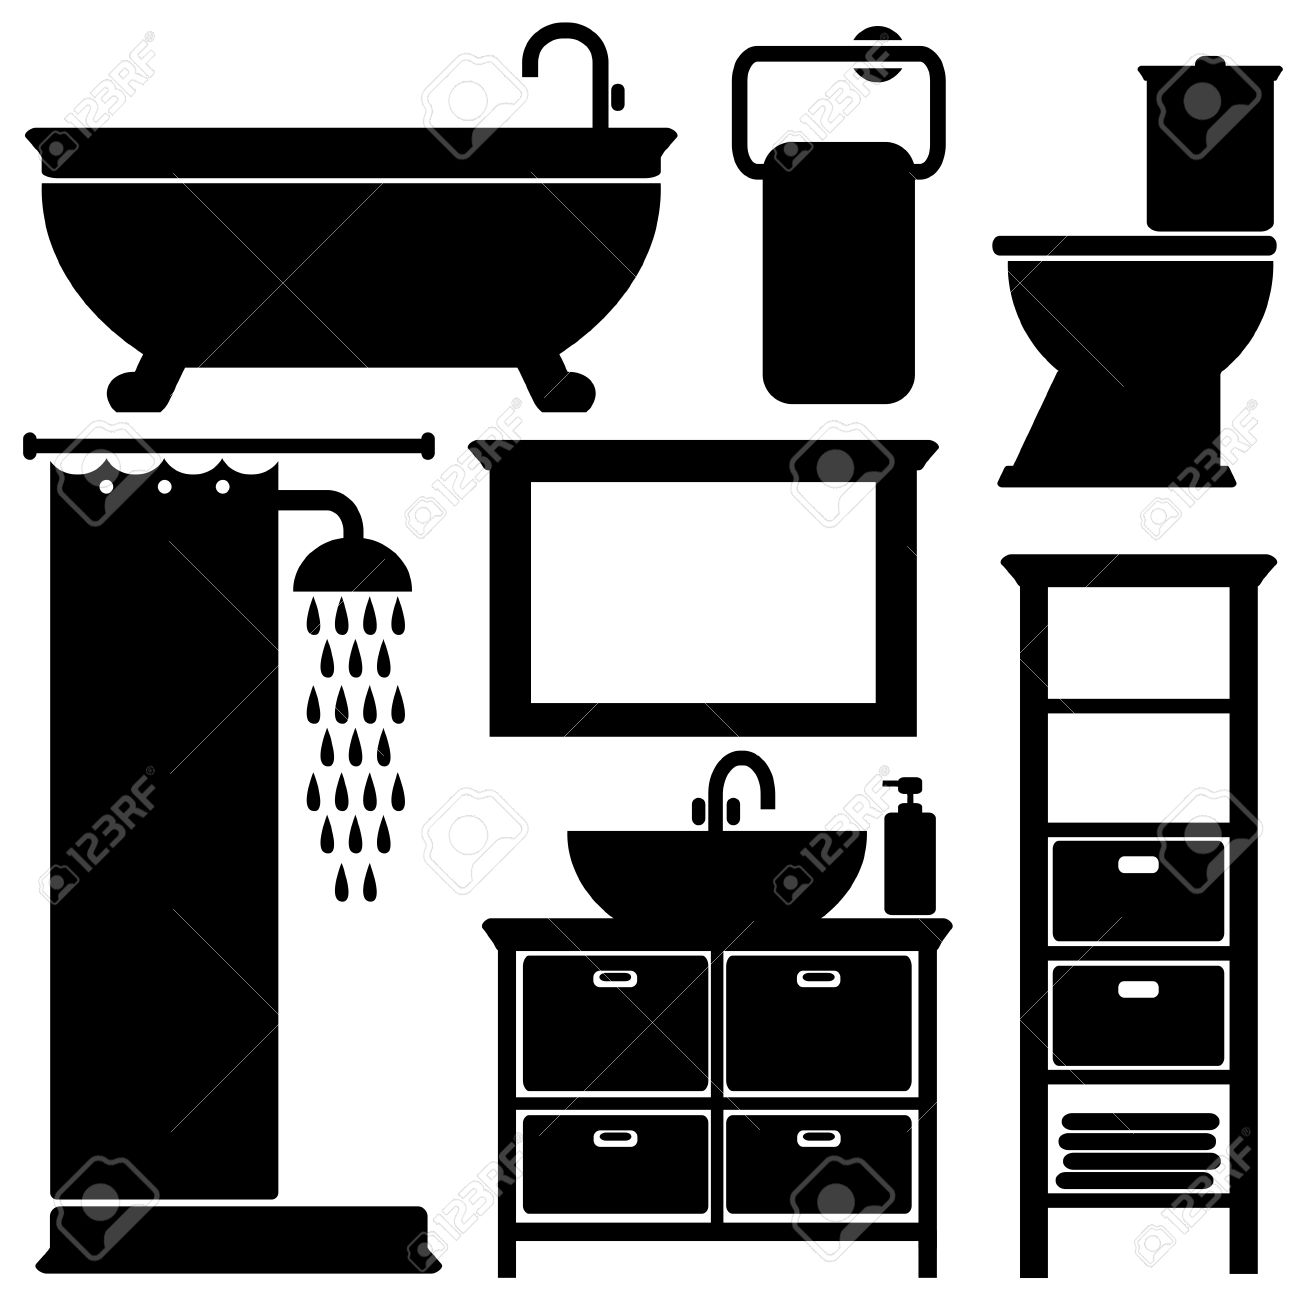 Bathroom Toilet Black Icons Set Silhouettes On White Background Vector Illustration Stock